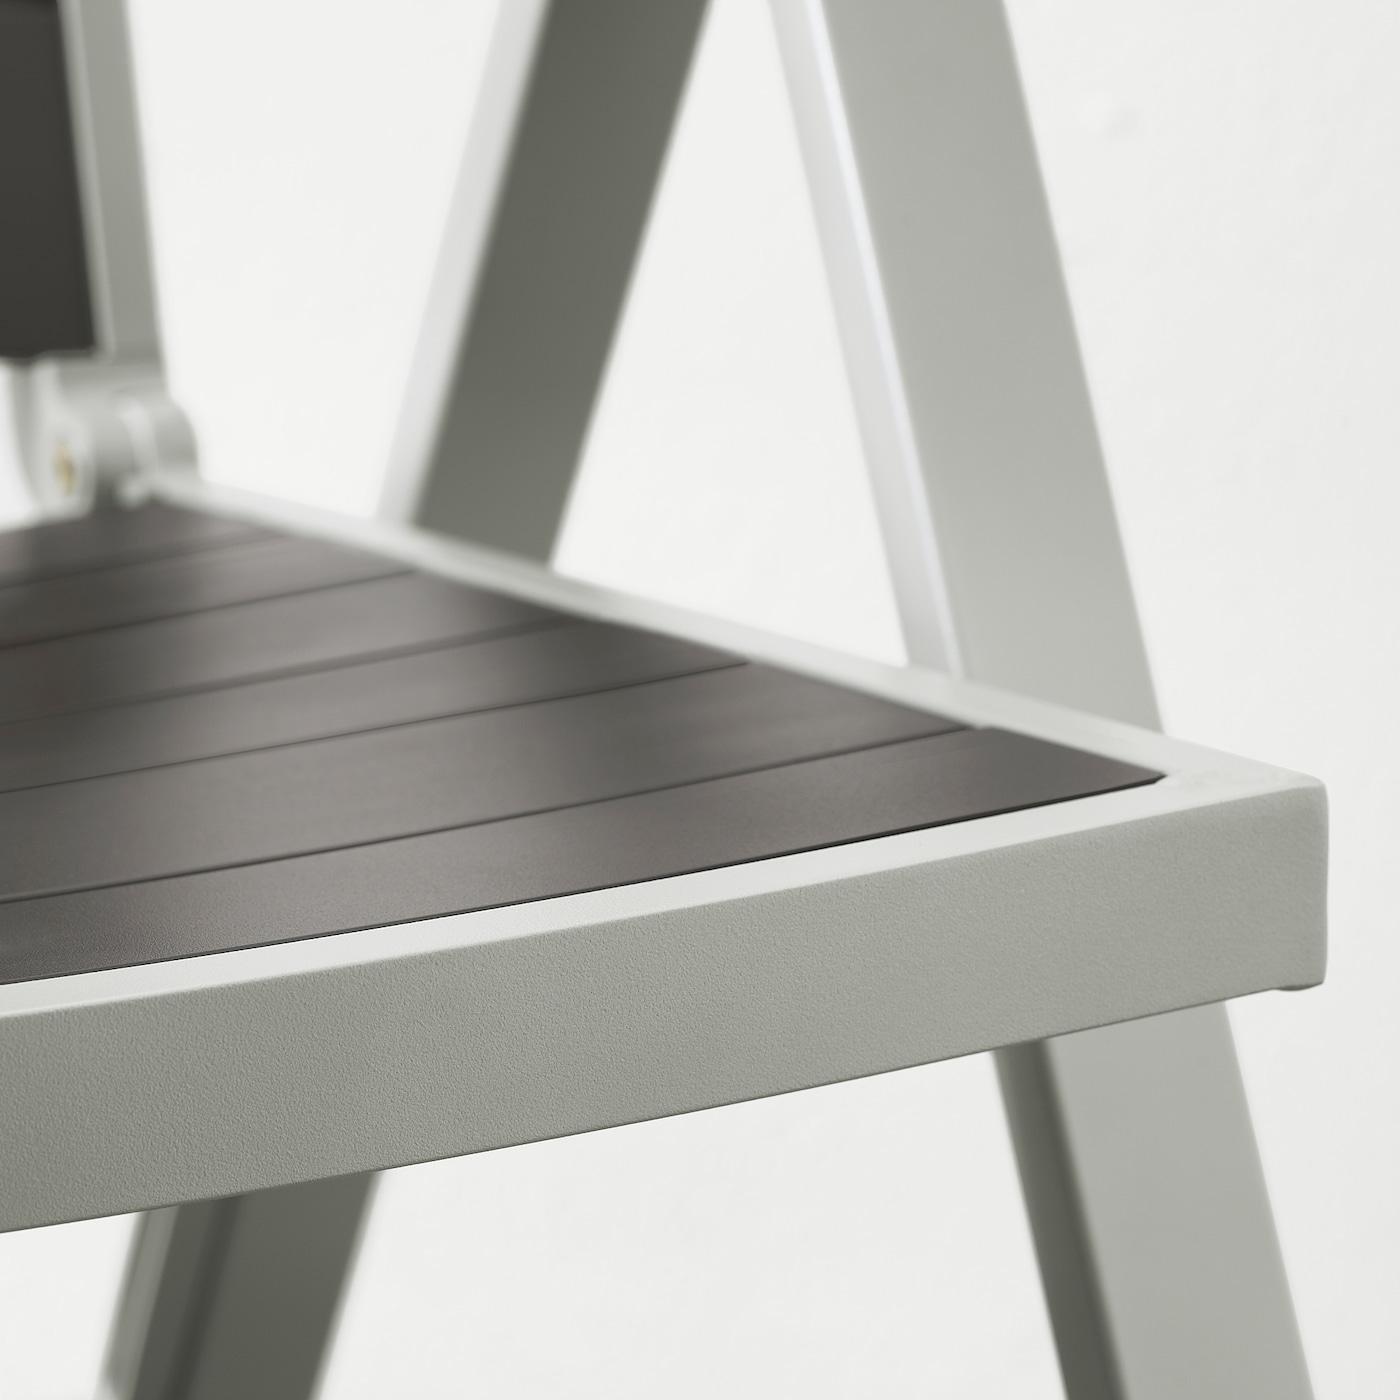 Sjalland Reclining Chair Outdoor Light Grey Foldable Dark Grey Ikea